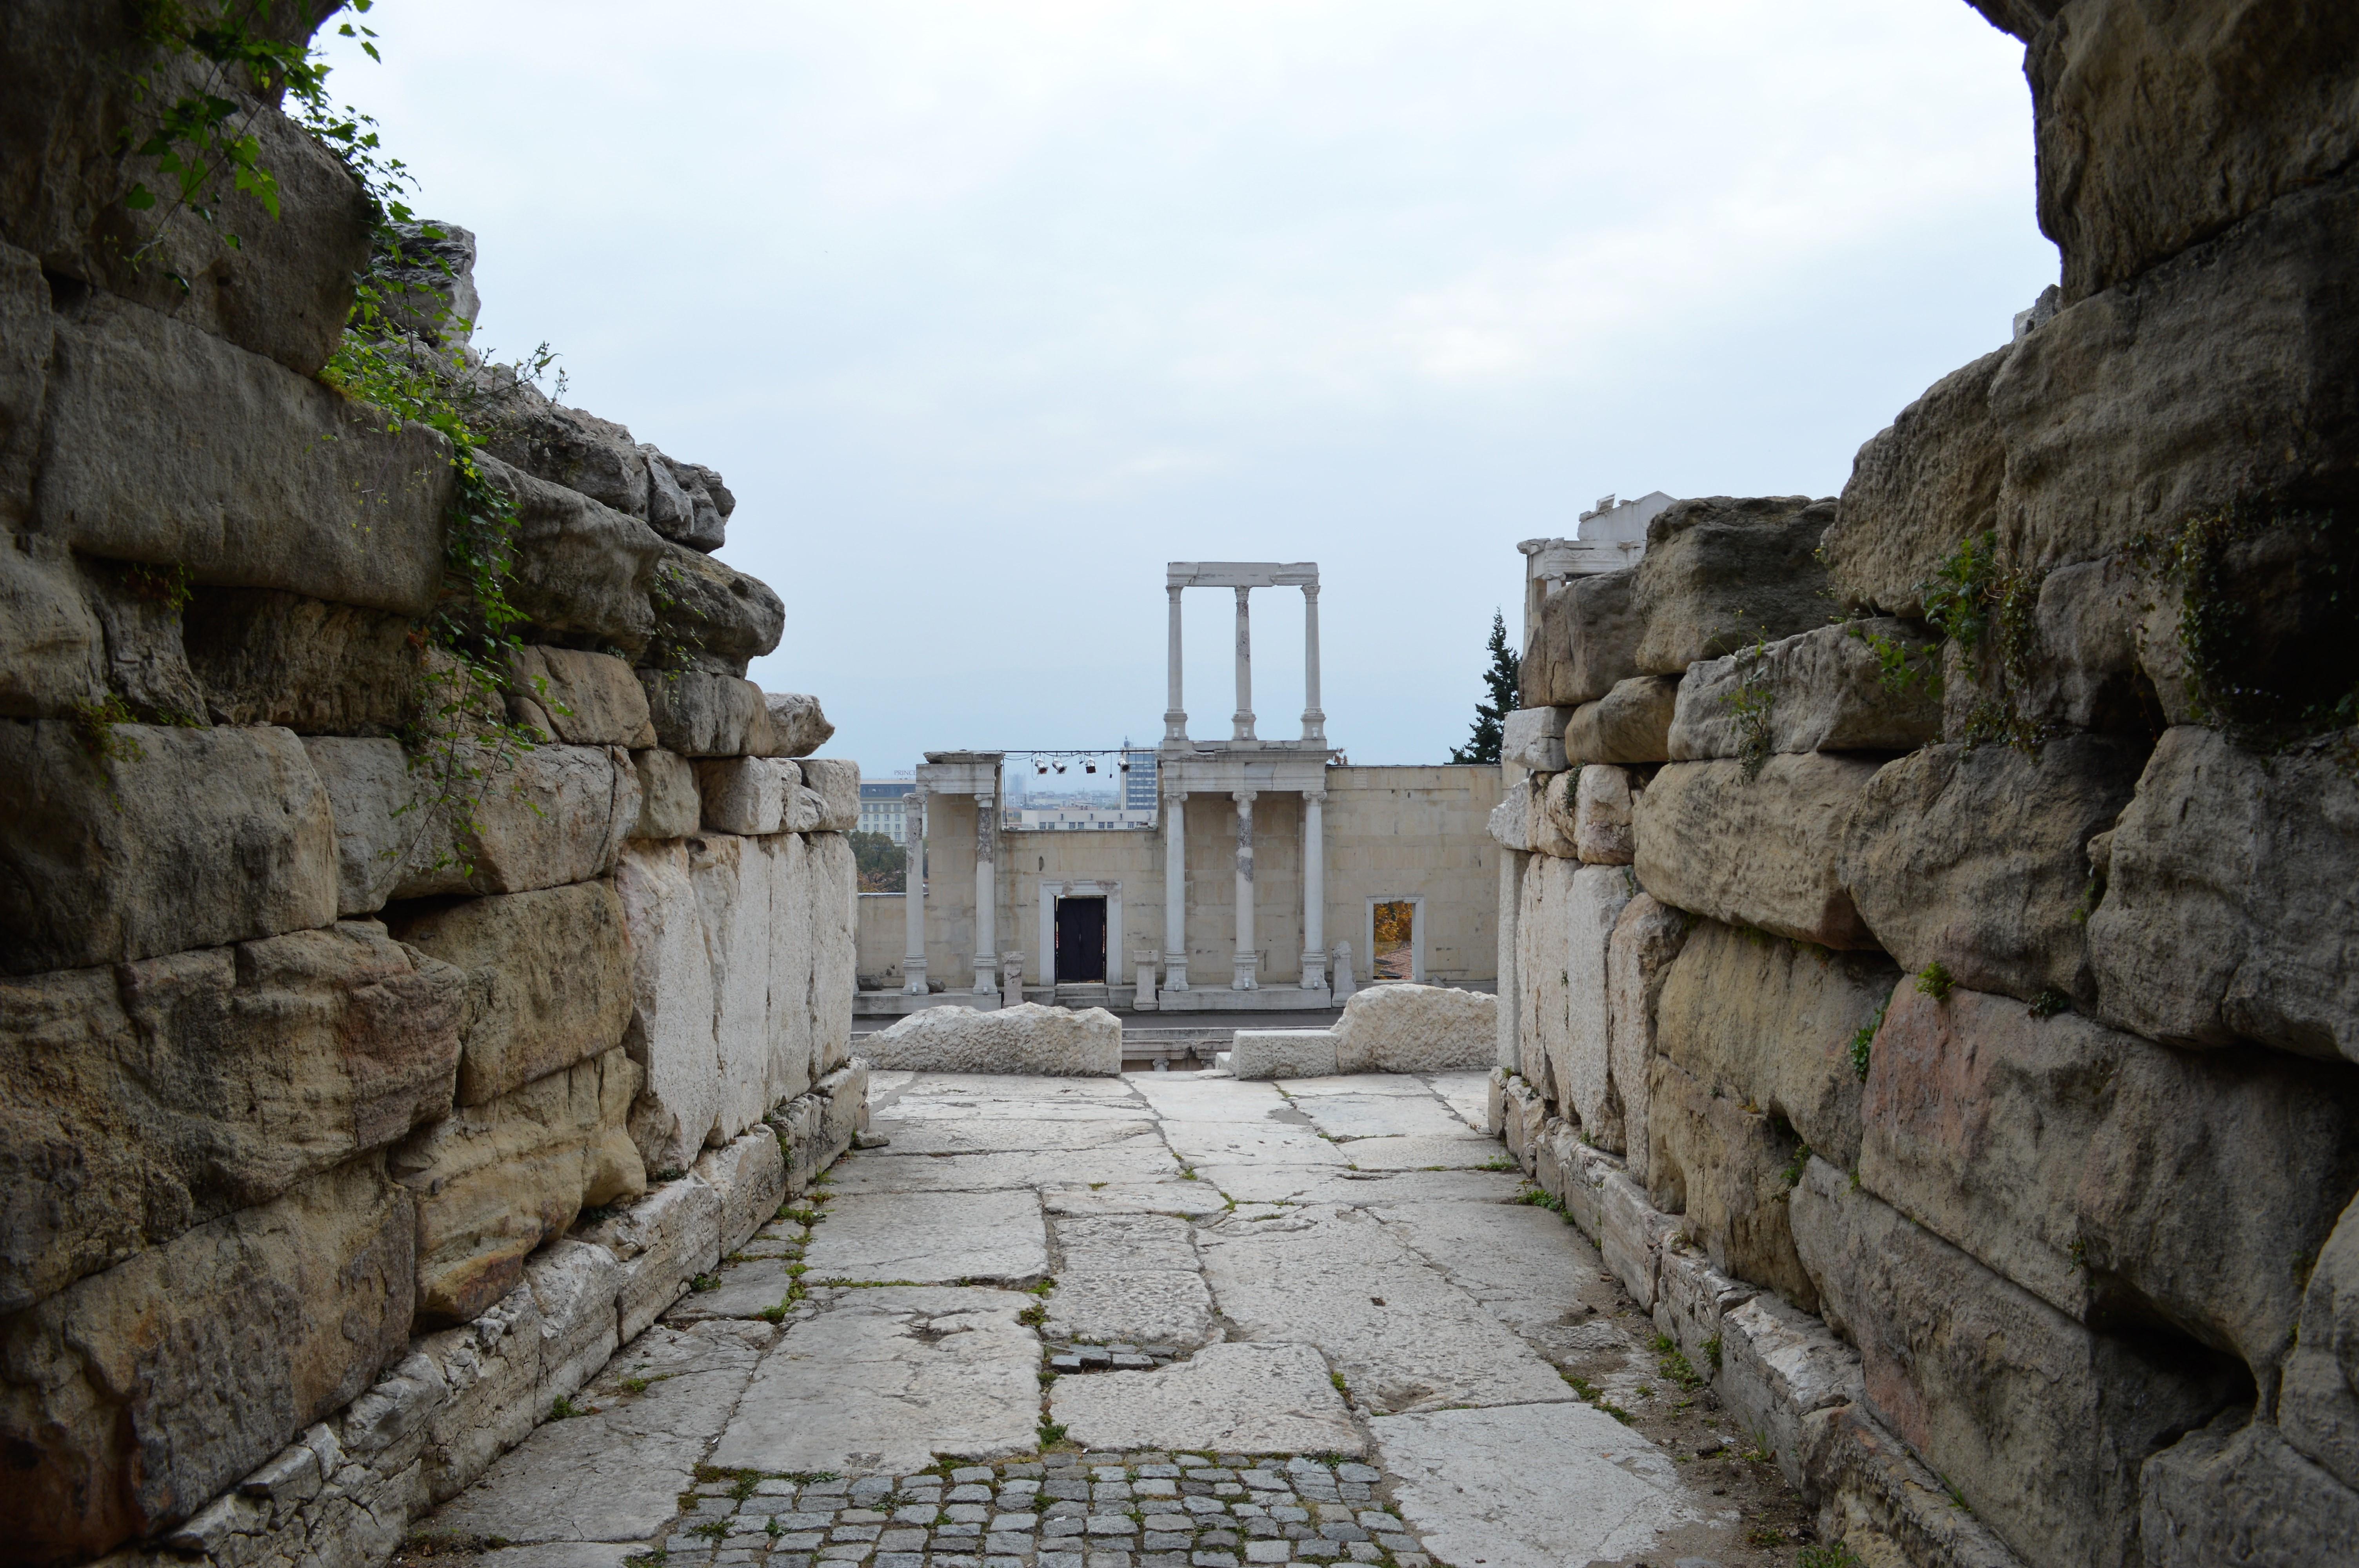 plovdiv-amphitheater-2